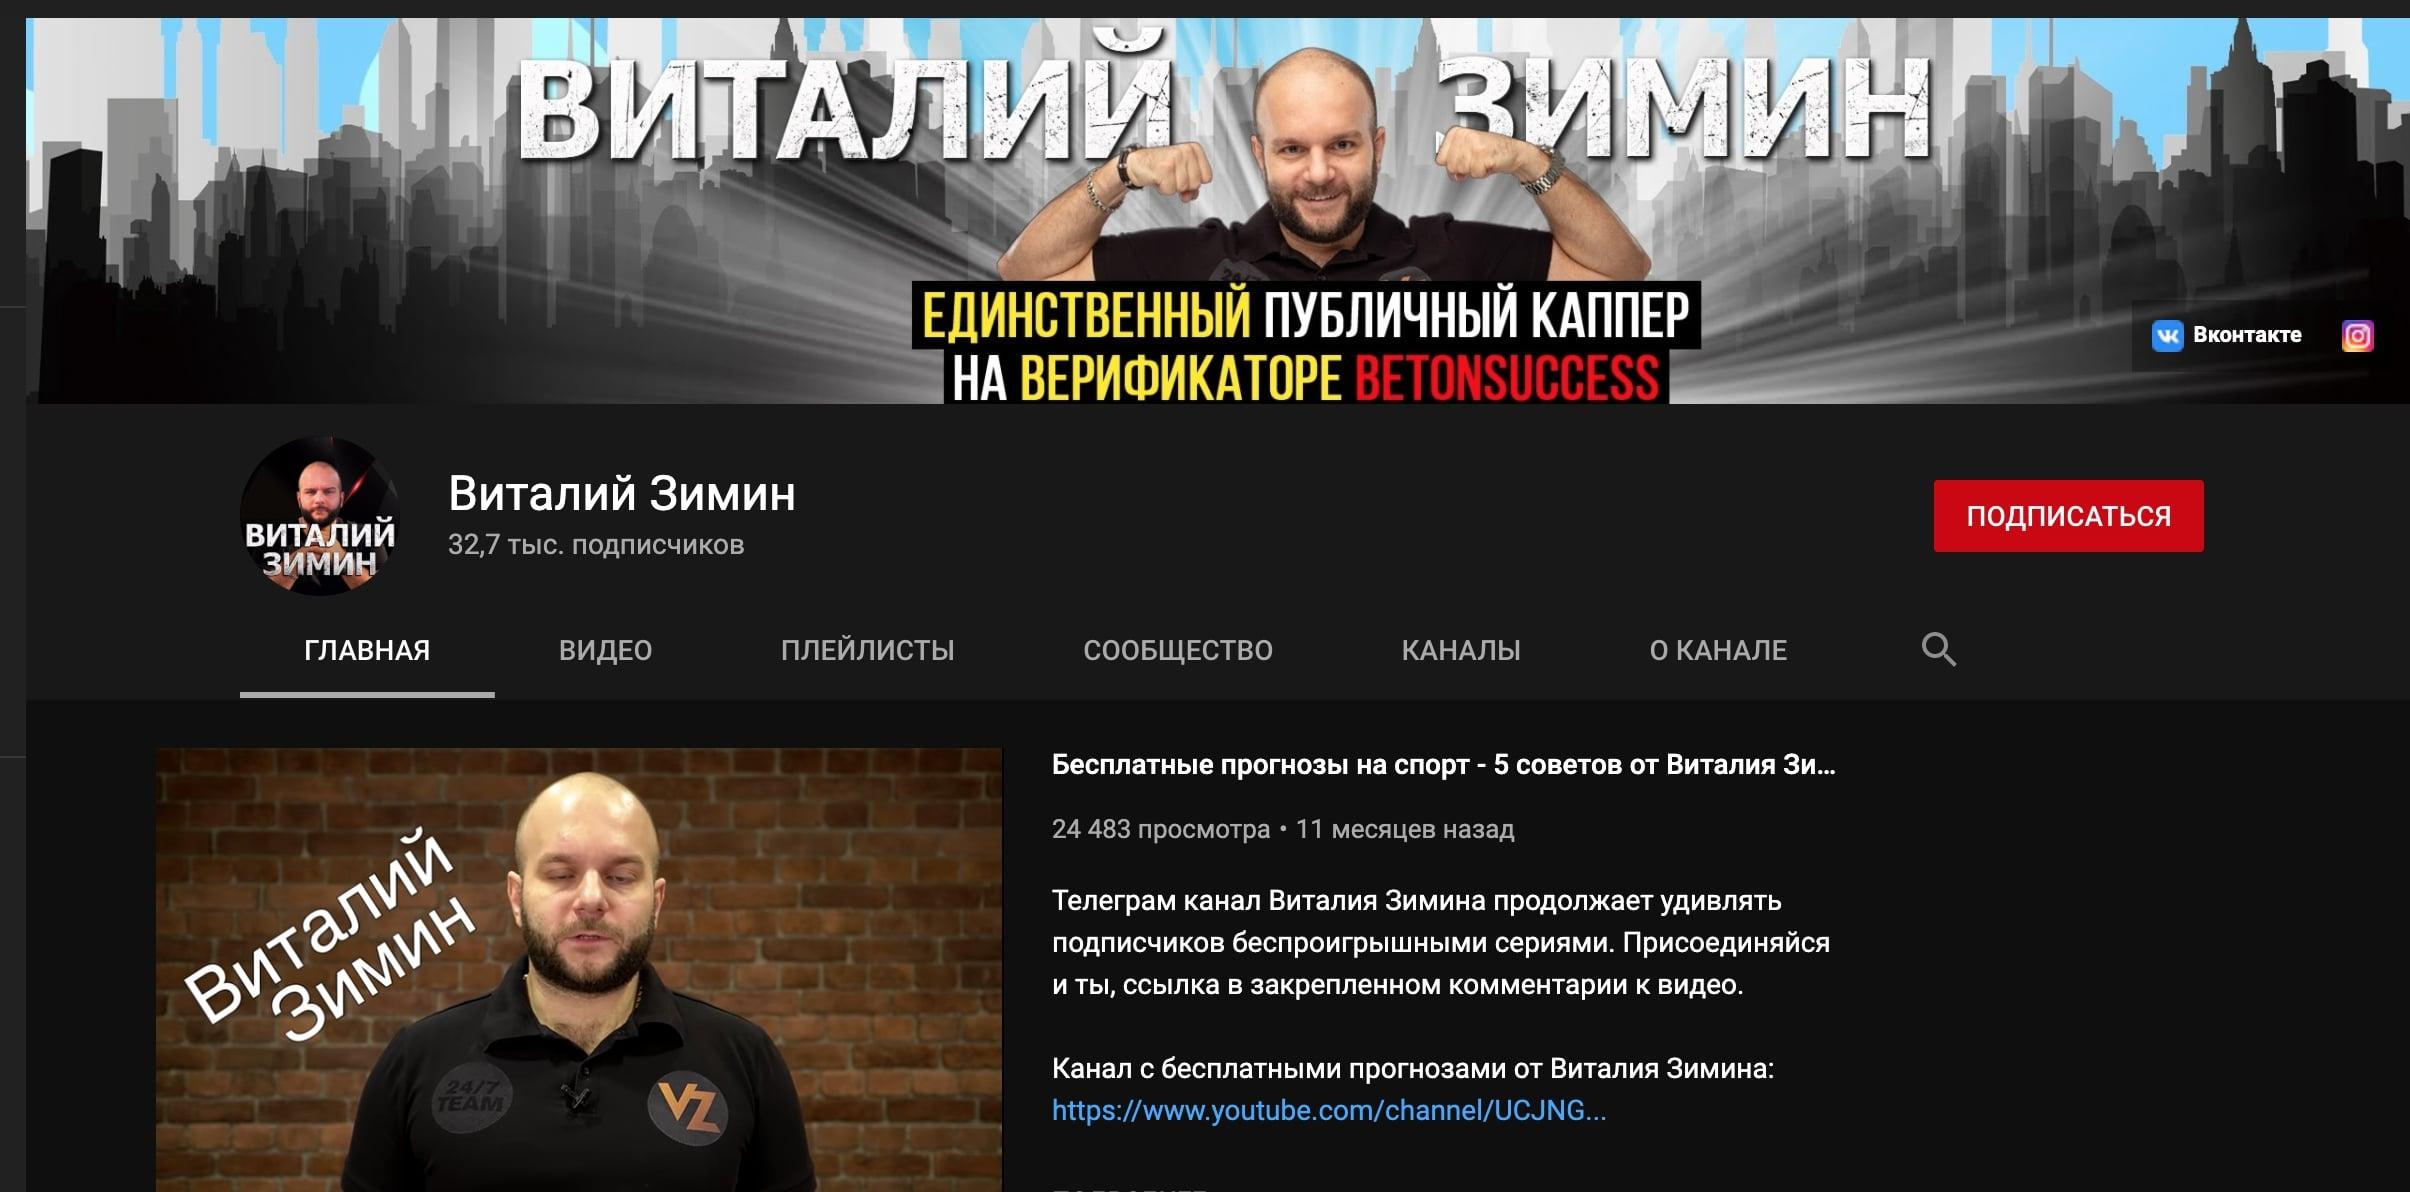 Ютуб канал каппера Виталия Зимина